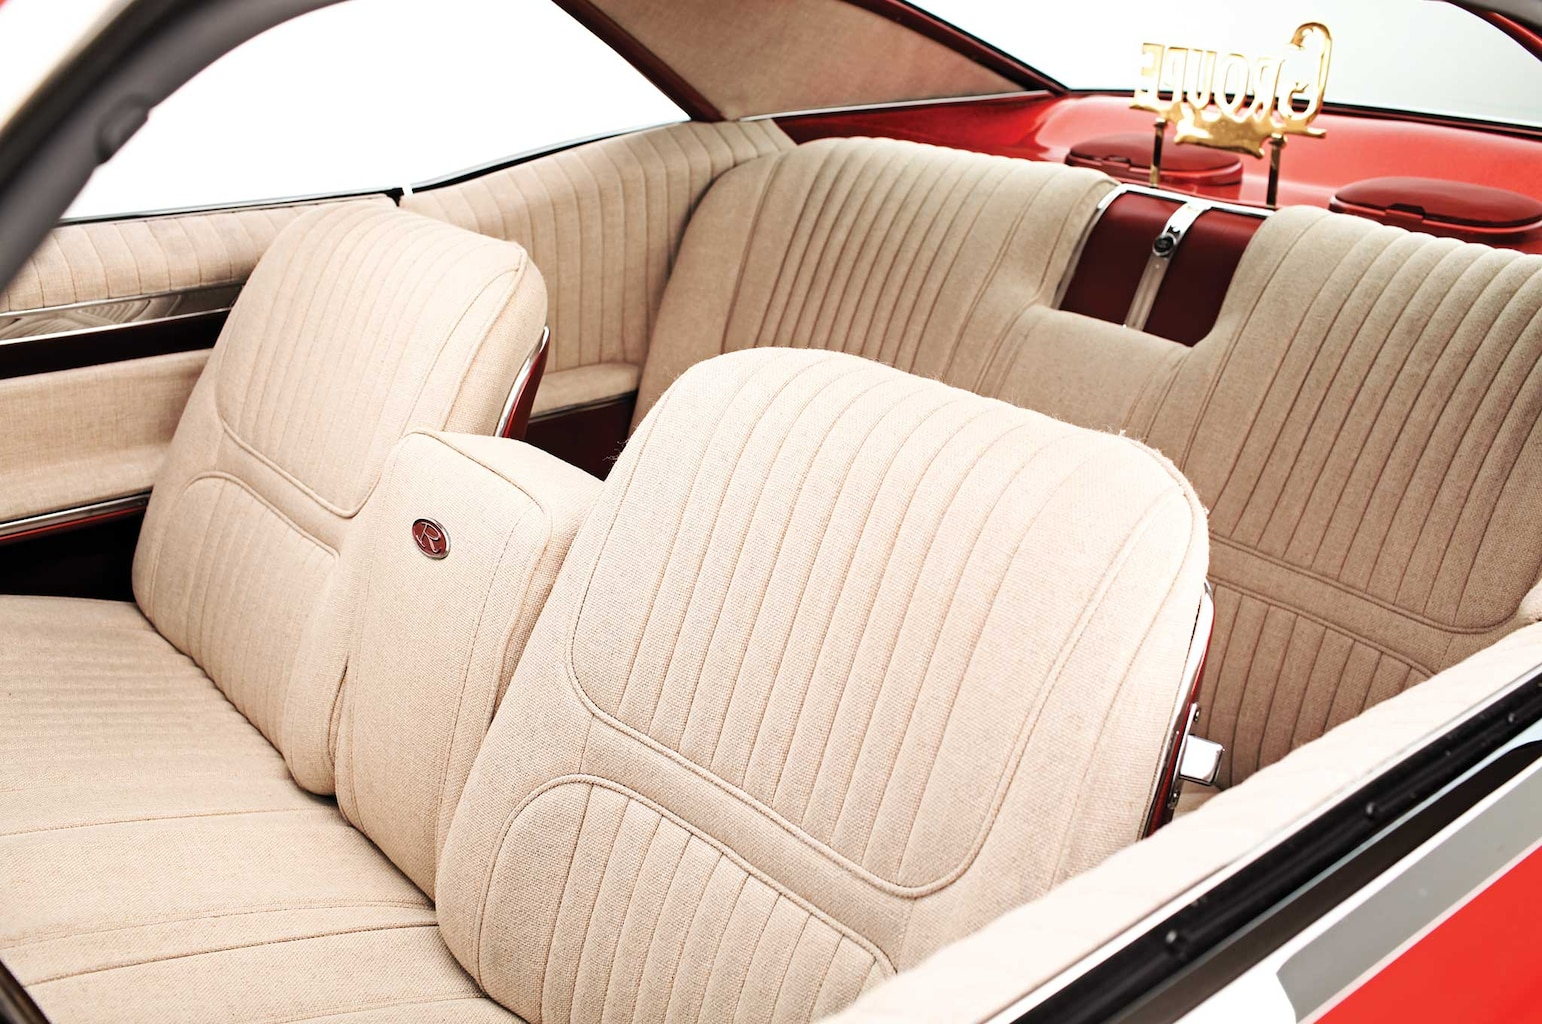 1967 buick riviera tan tweed interior 008